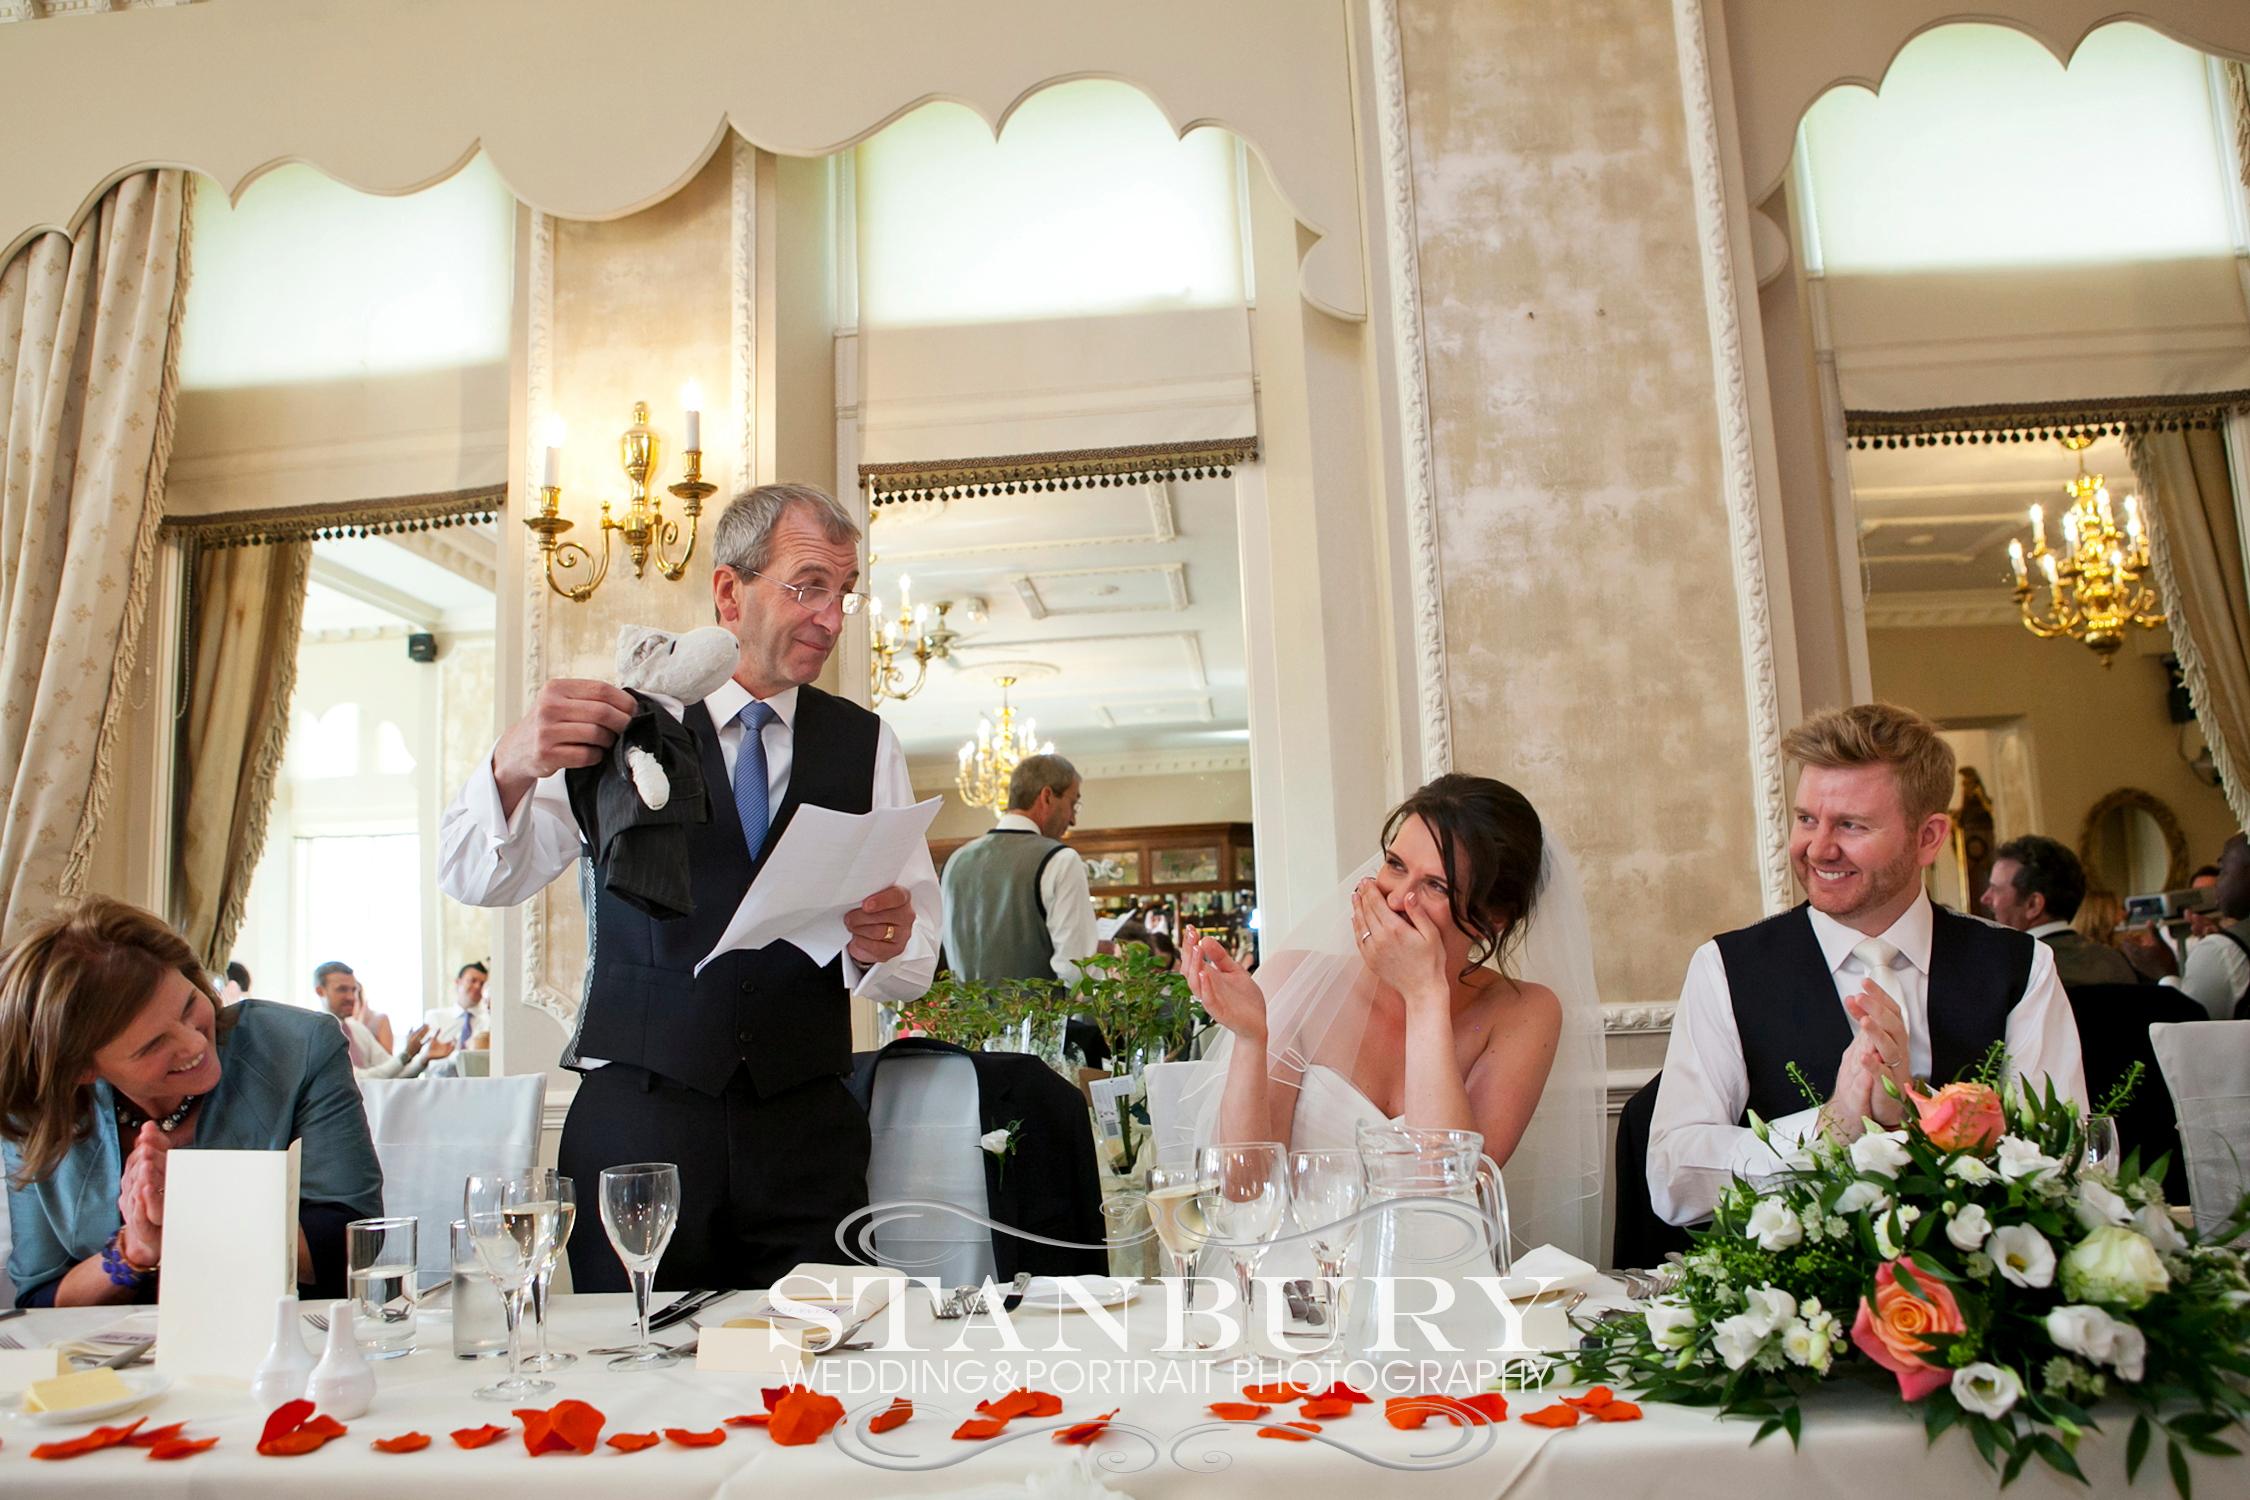 Wedding Photography at Merewood House, Lake District by David & Jane Stanbury